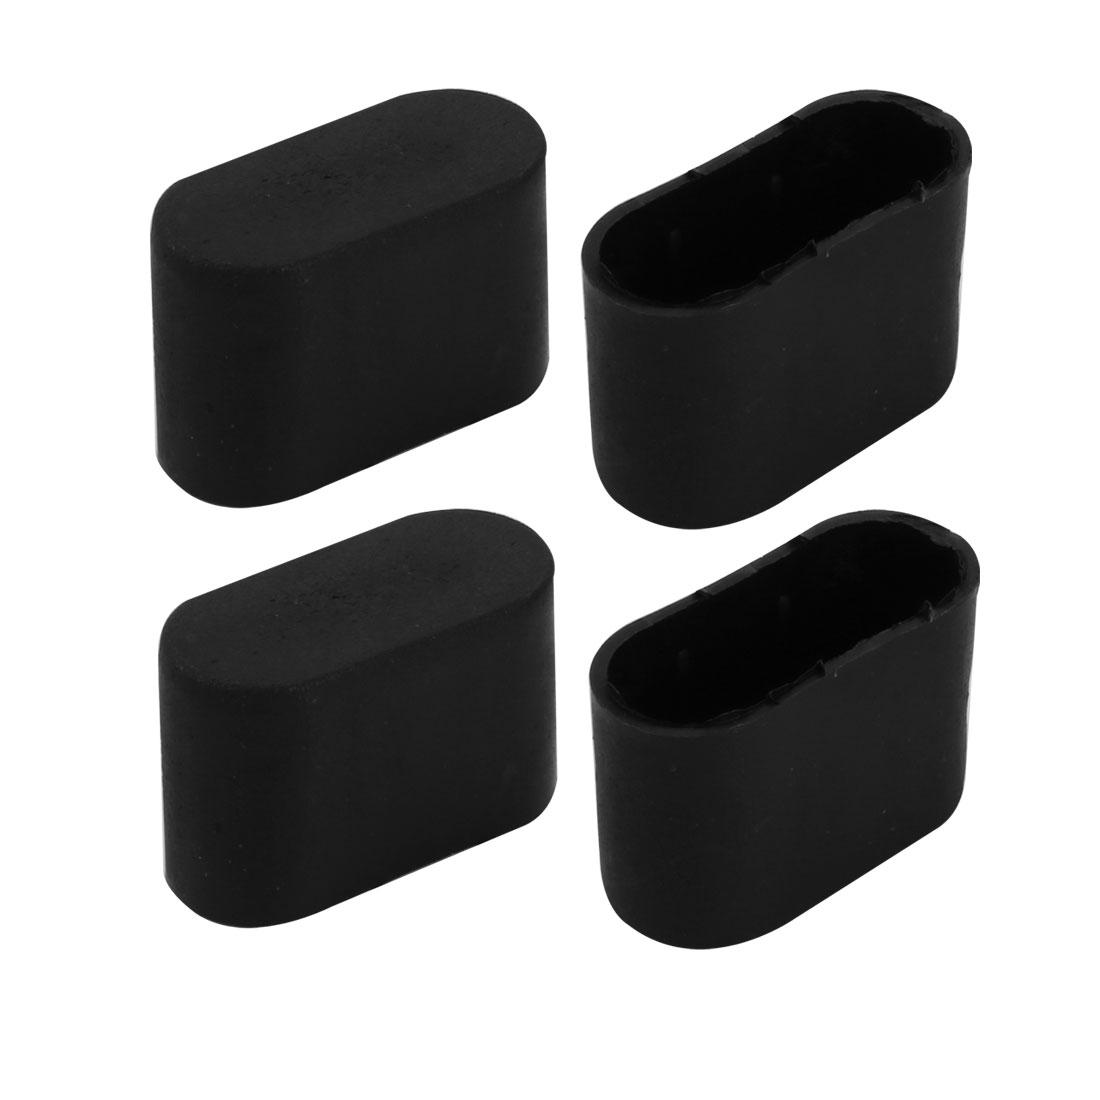 4pcs Furniture Desk Chair Foot Oval Plastic Tip Cap Fit for 34mmx14mm Leg Black